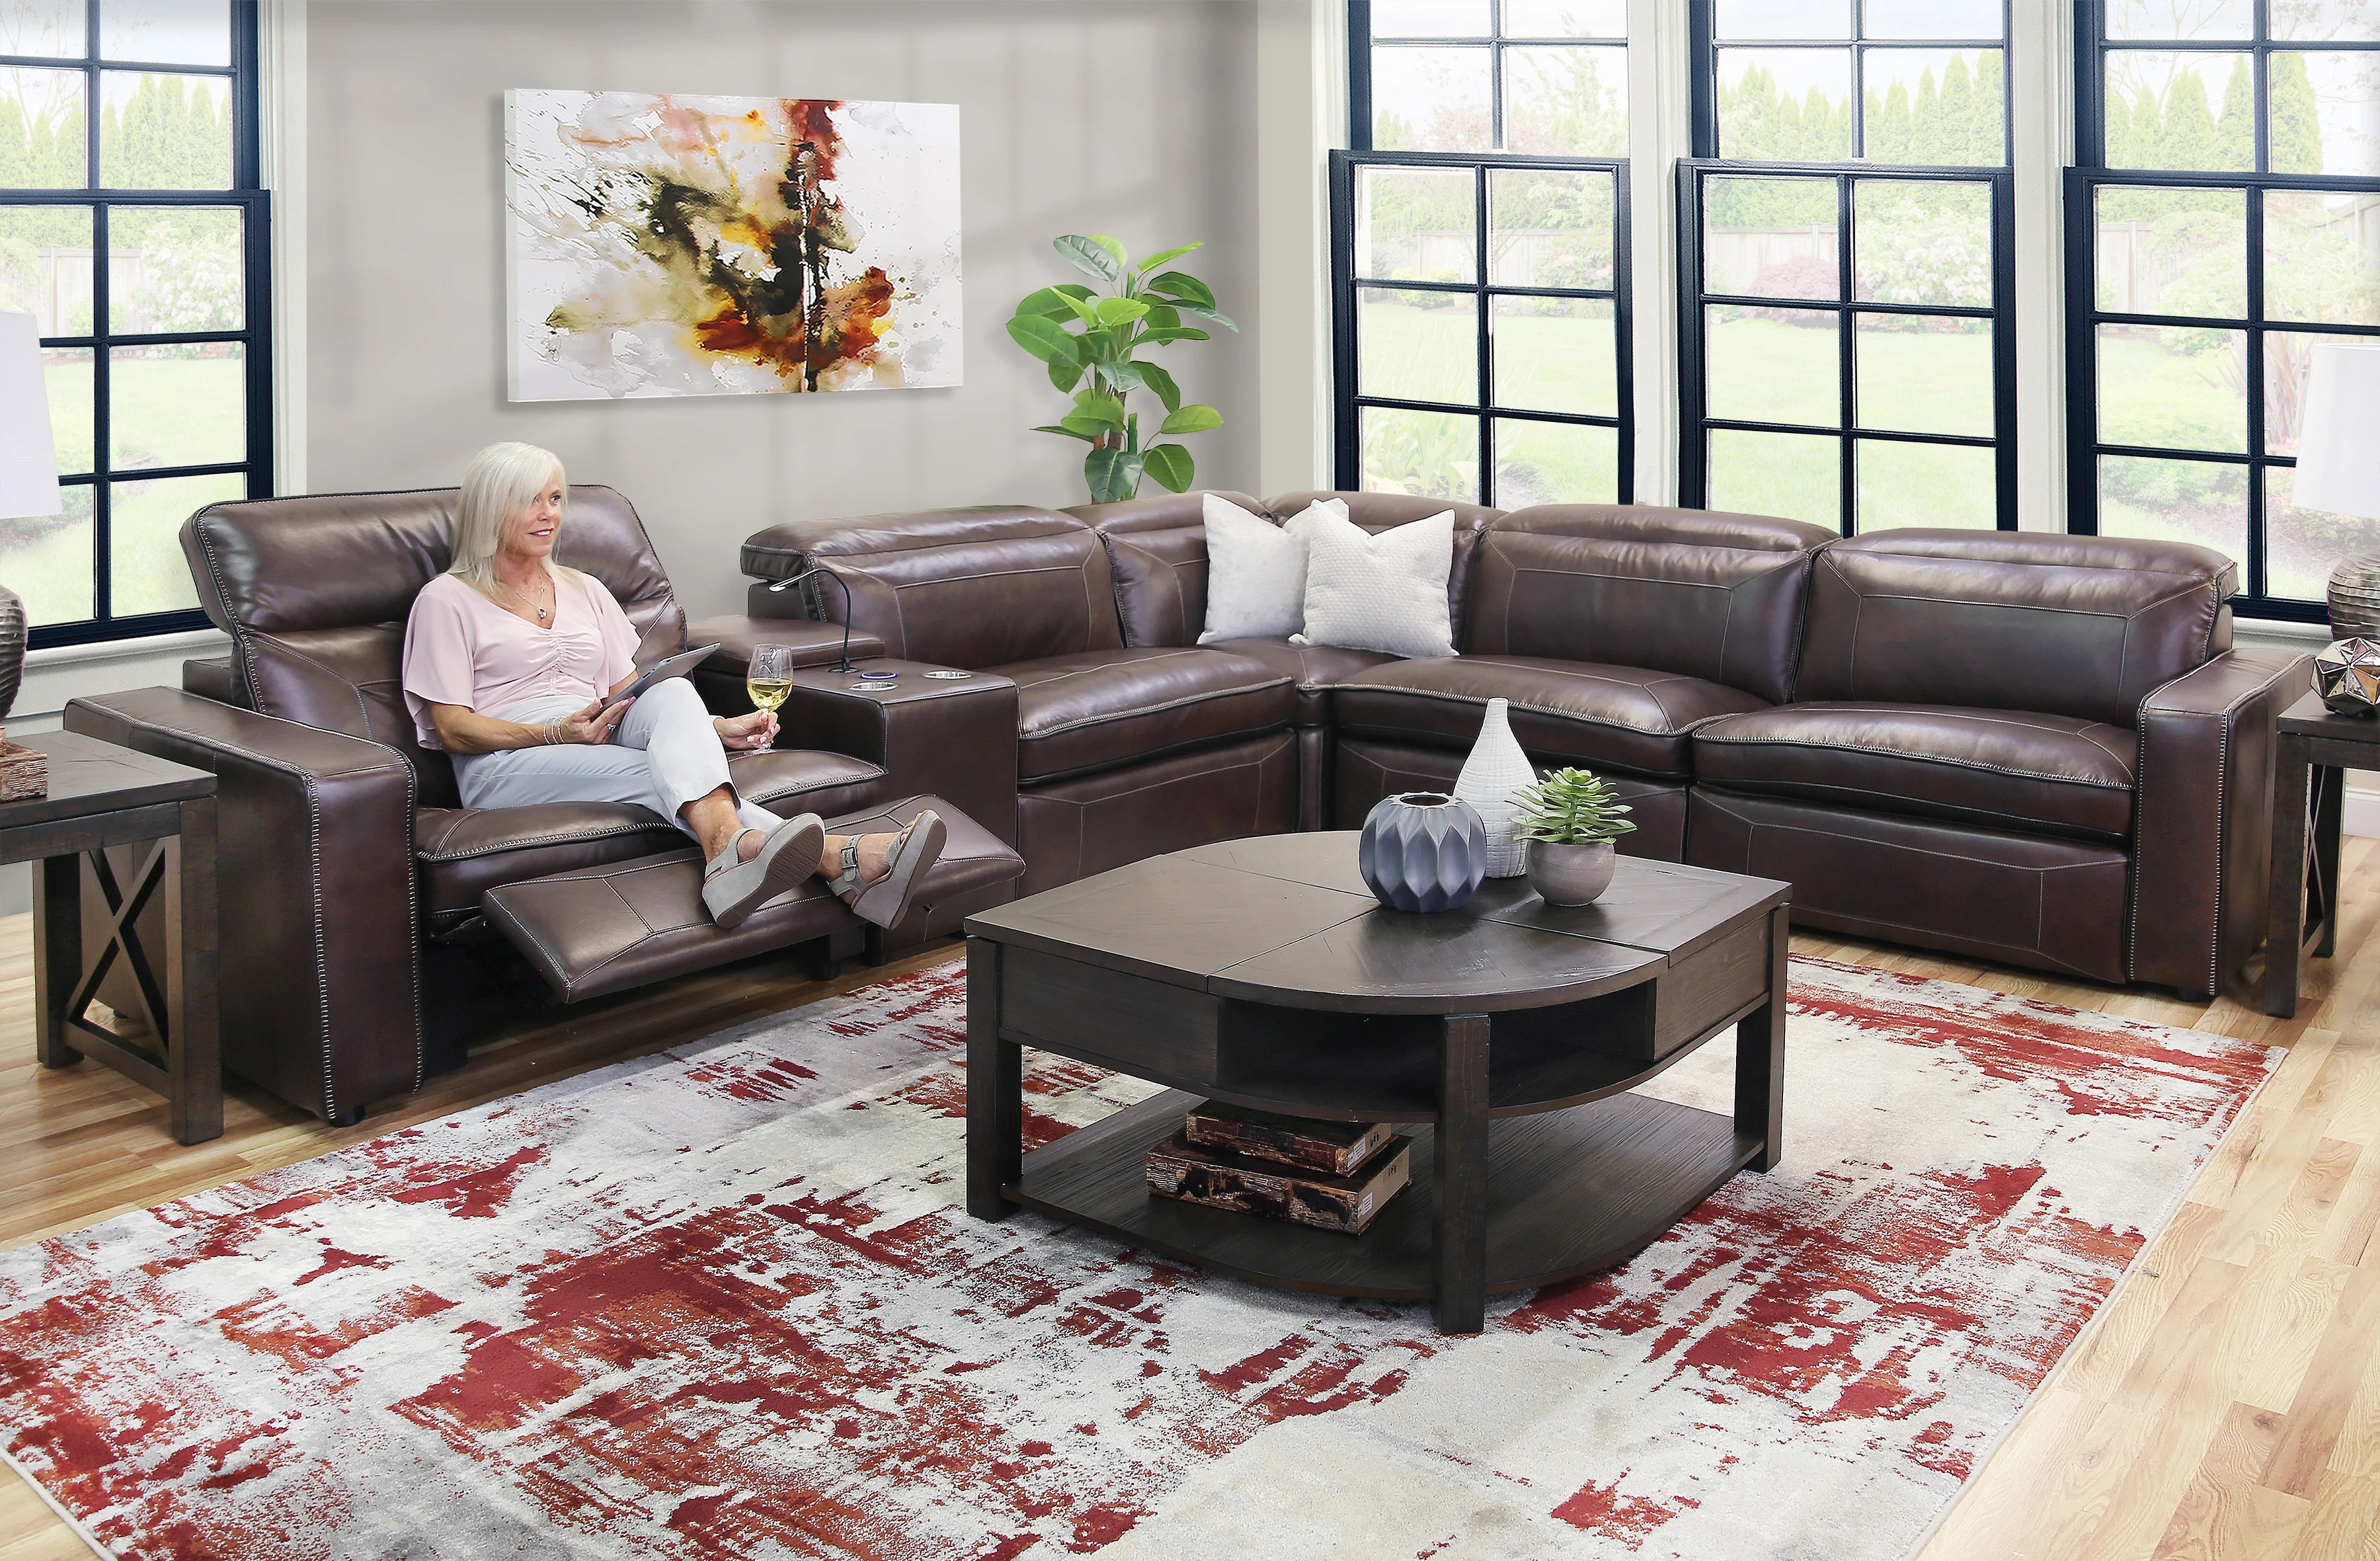 dorado 5 piece leather power reclining sectional sofa